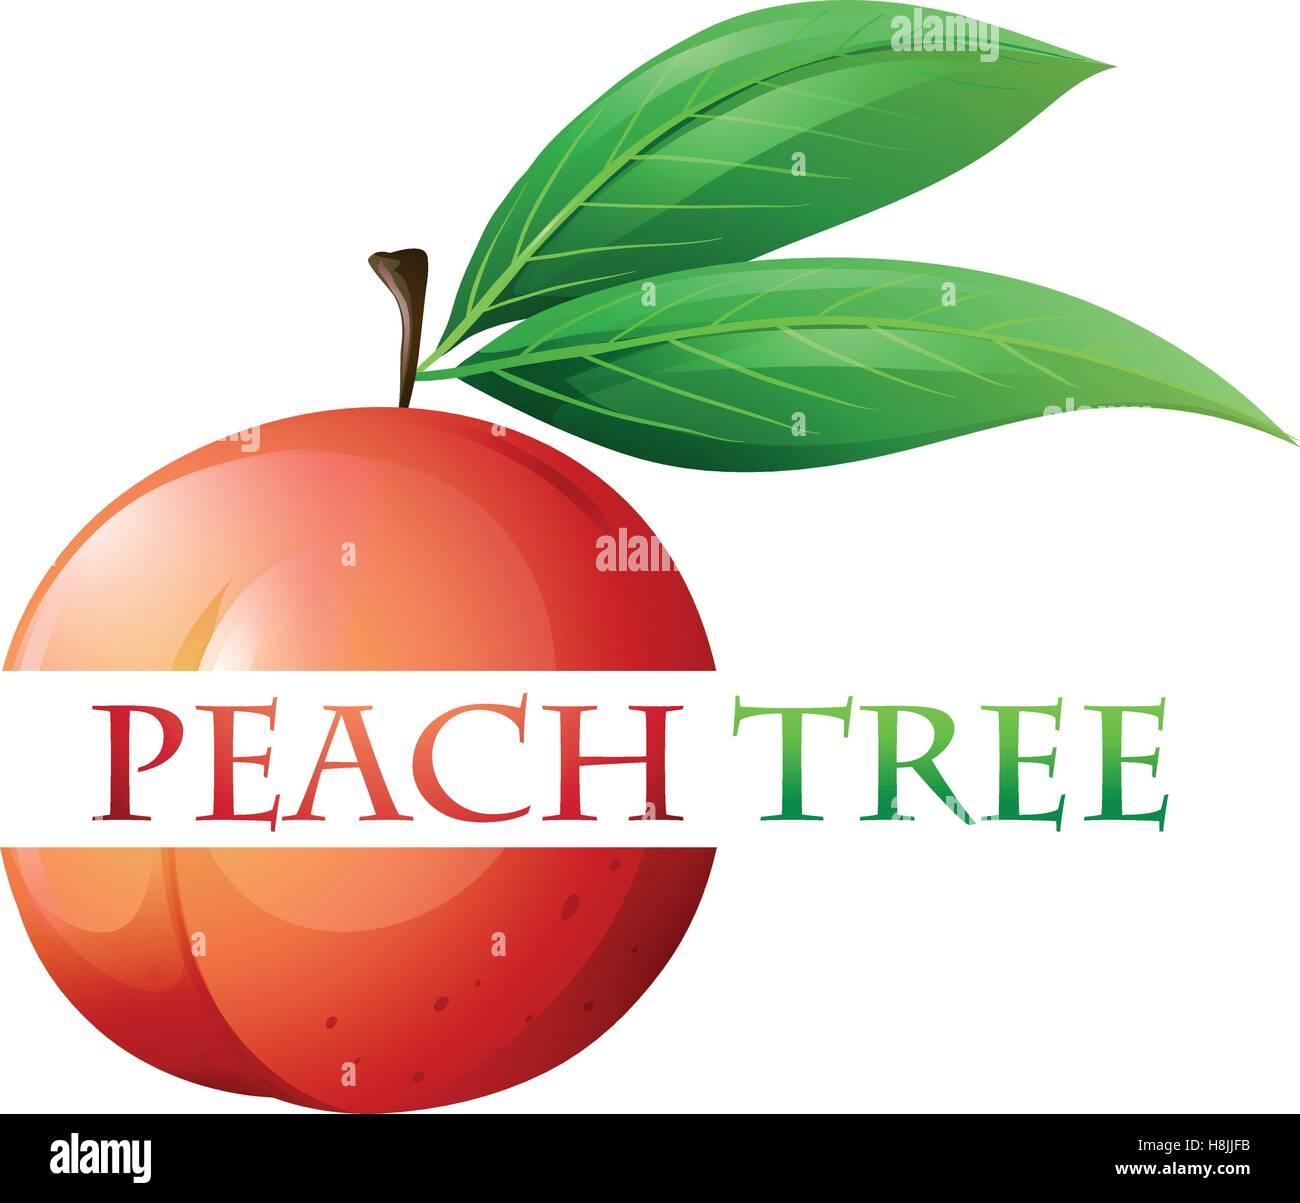 Font design for peach tree illustration stock vector art for Peach tree designs